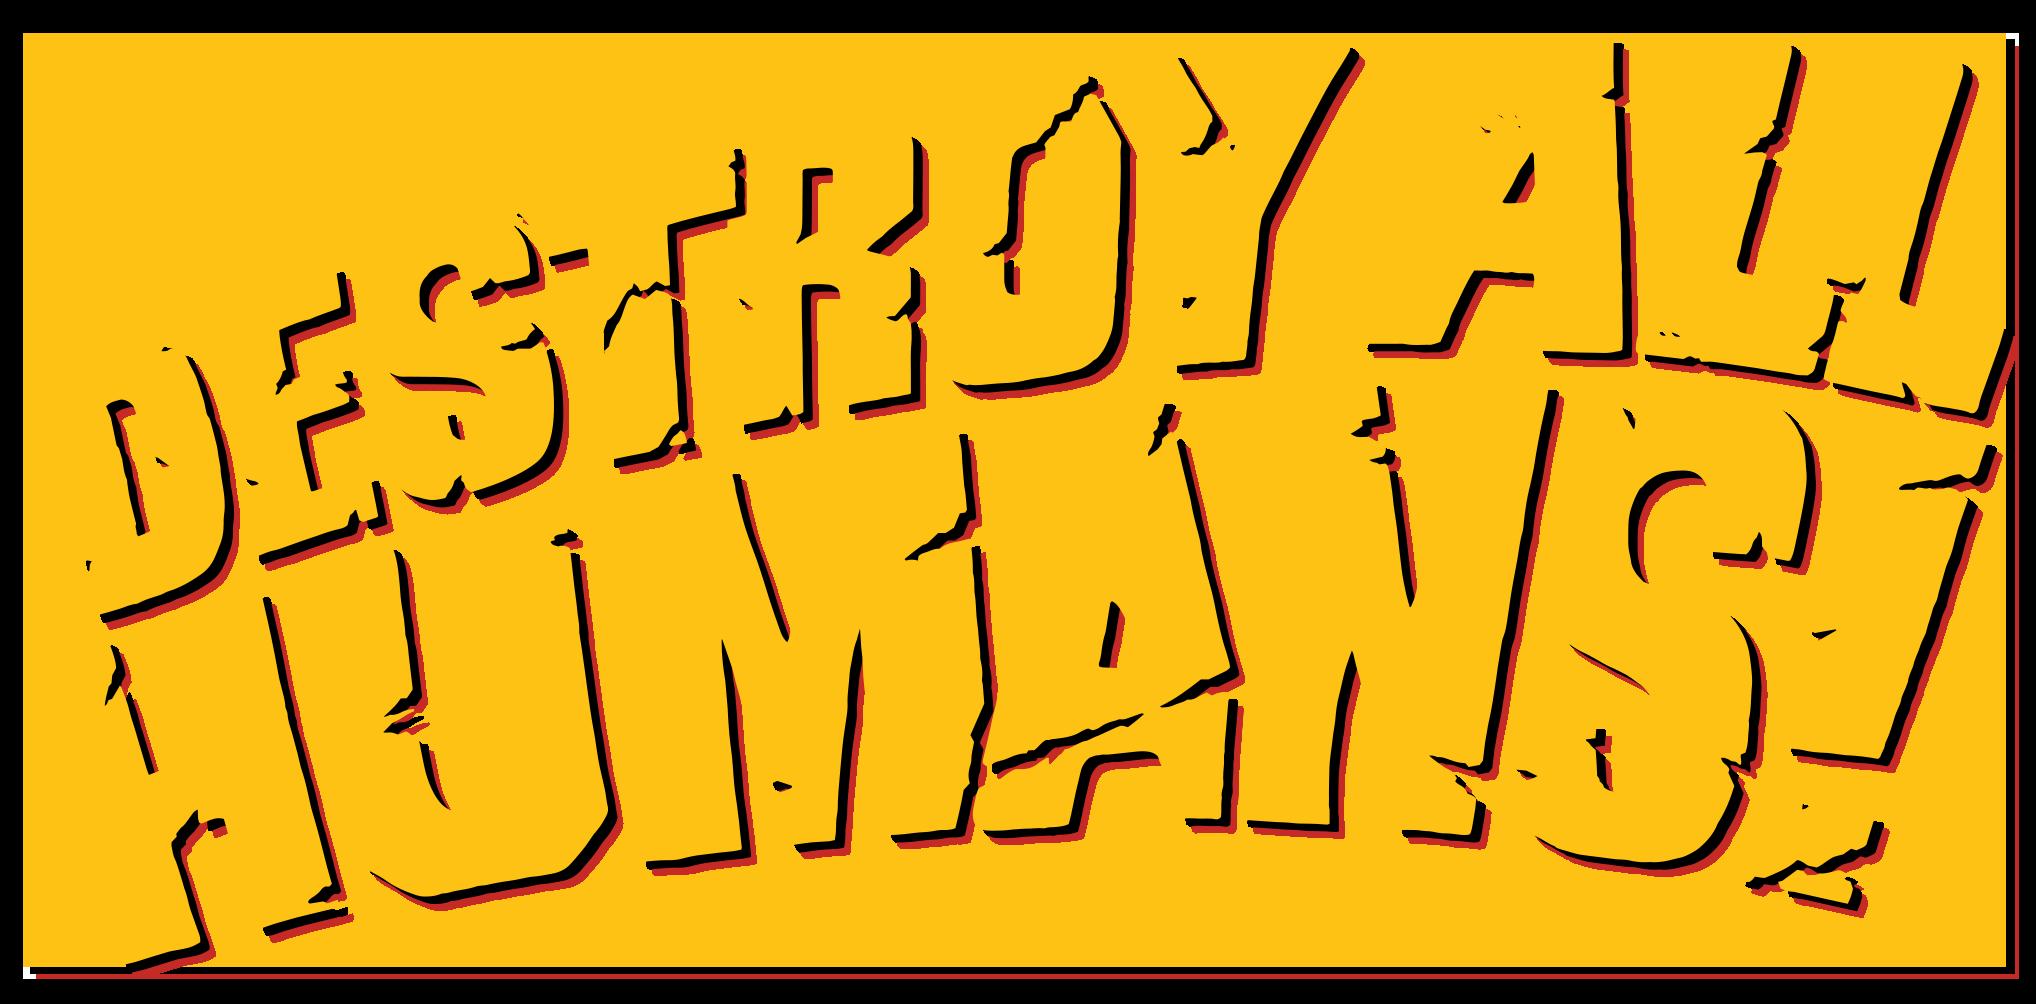 Destroy-All-Humans_2019_06-07-19_019